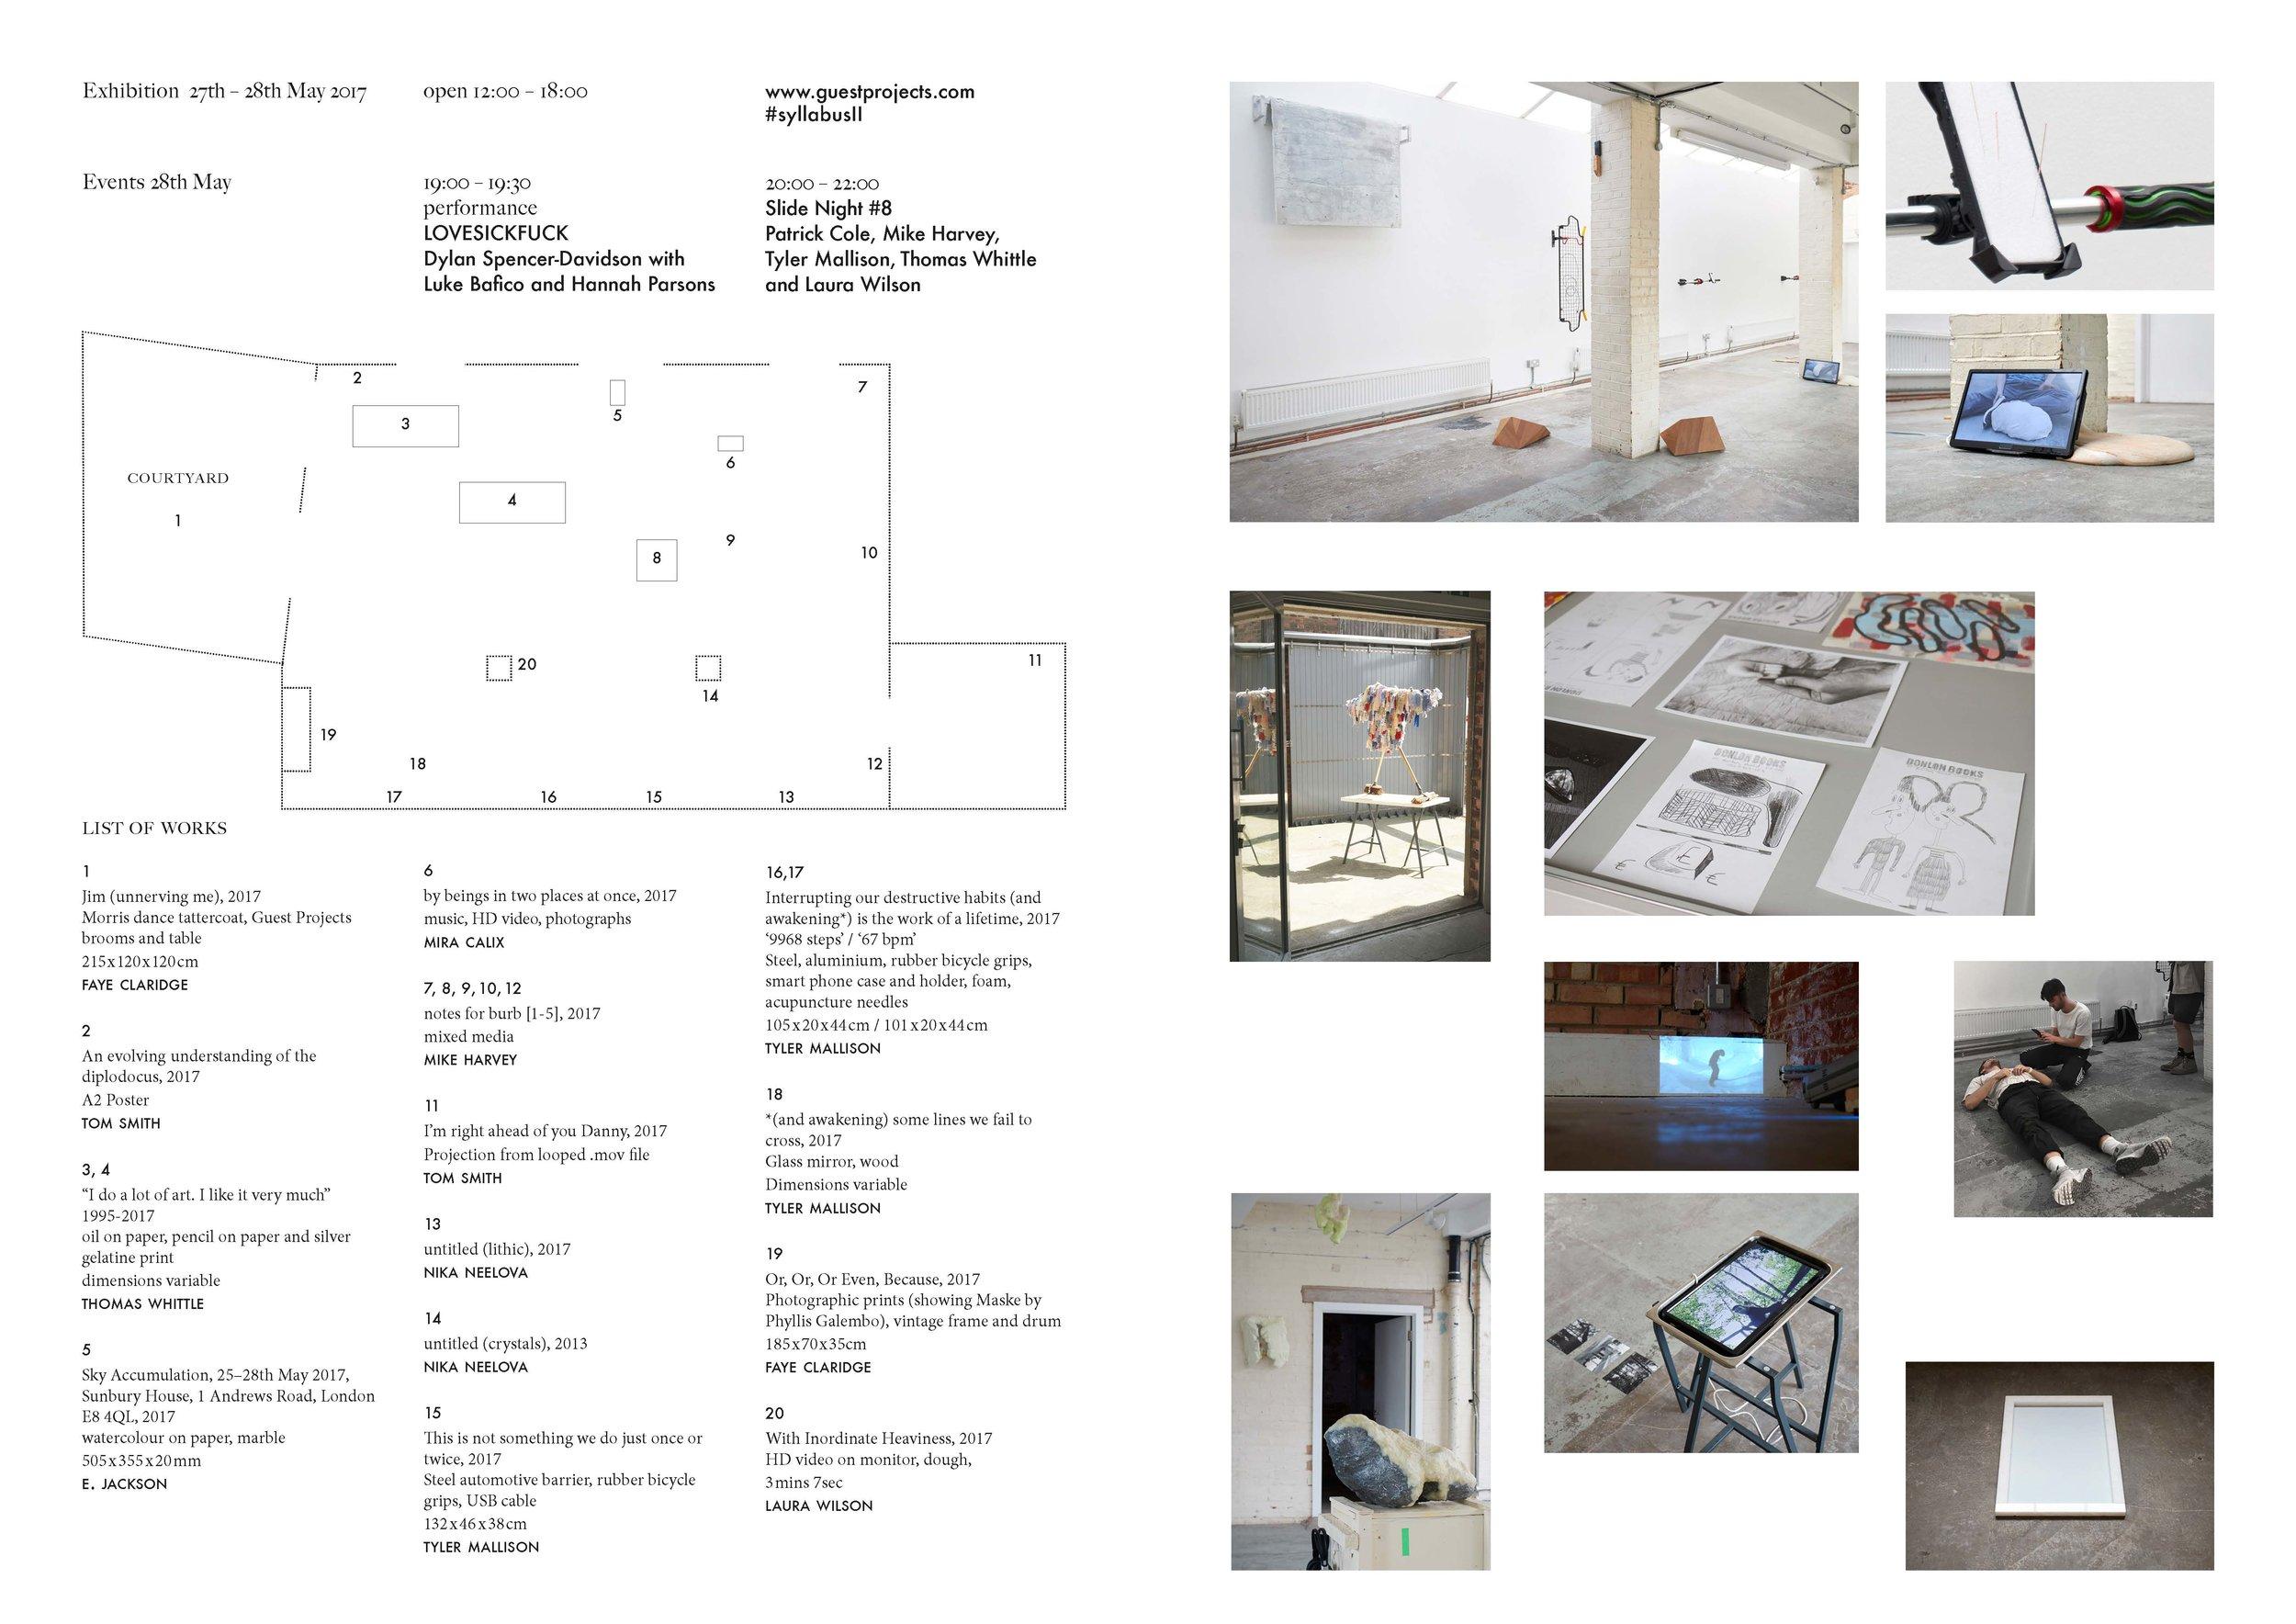 Click image to view PDF